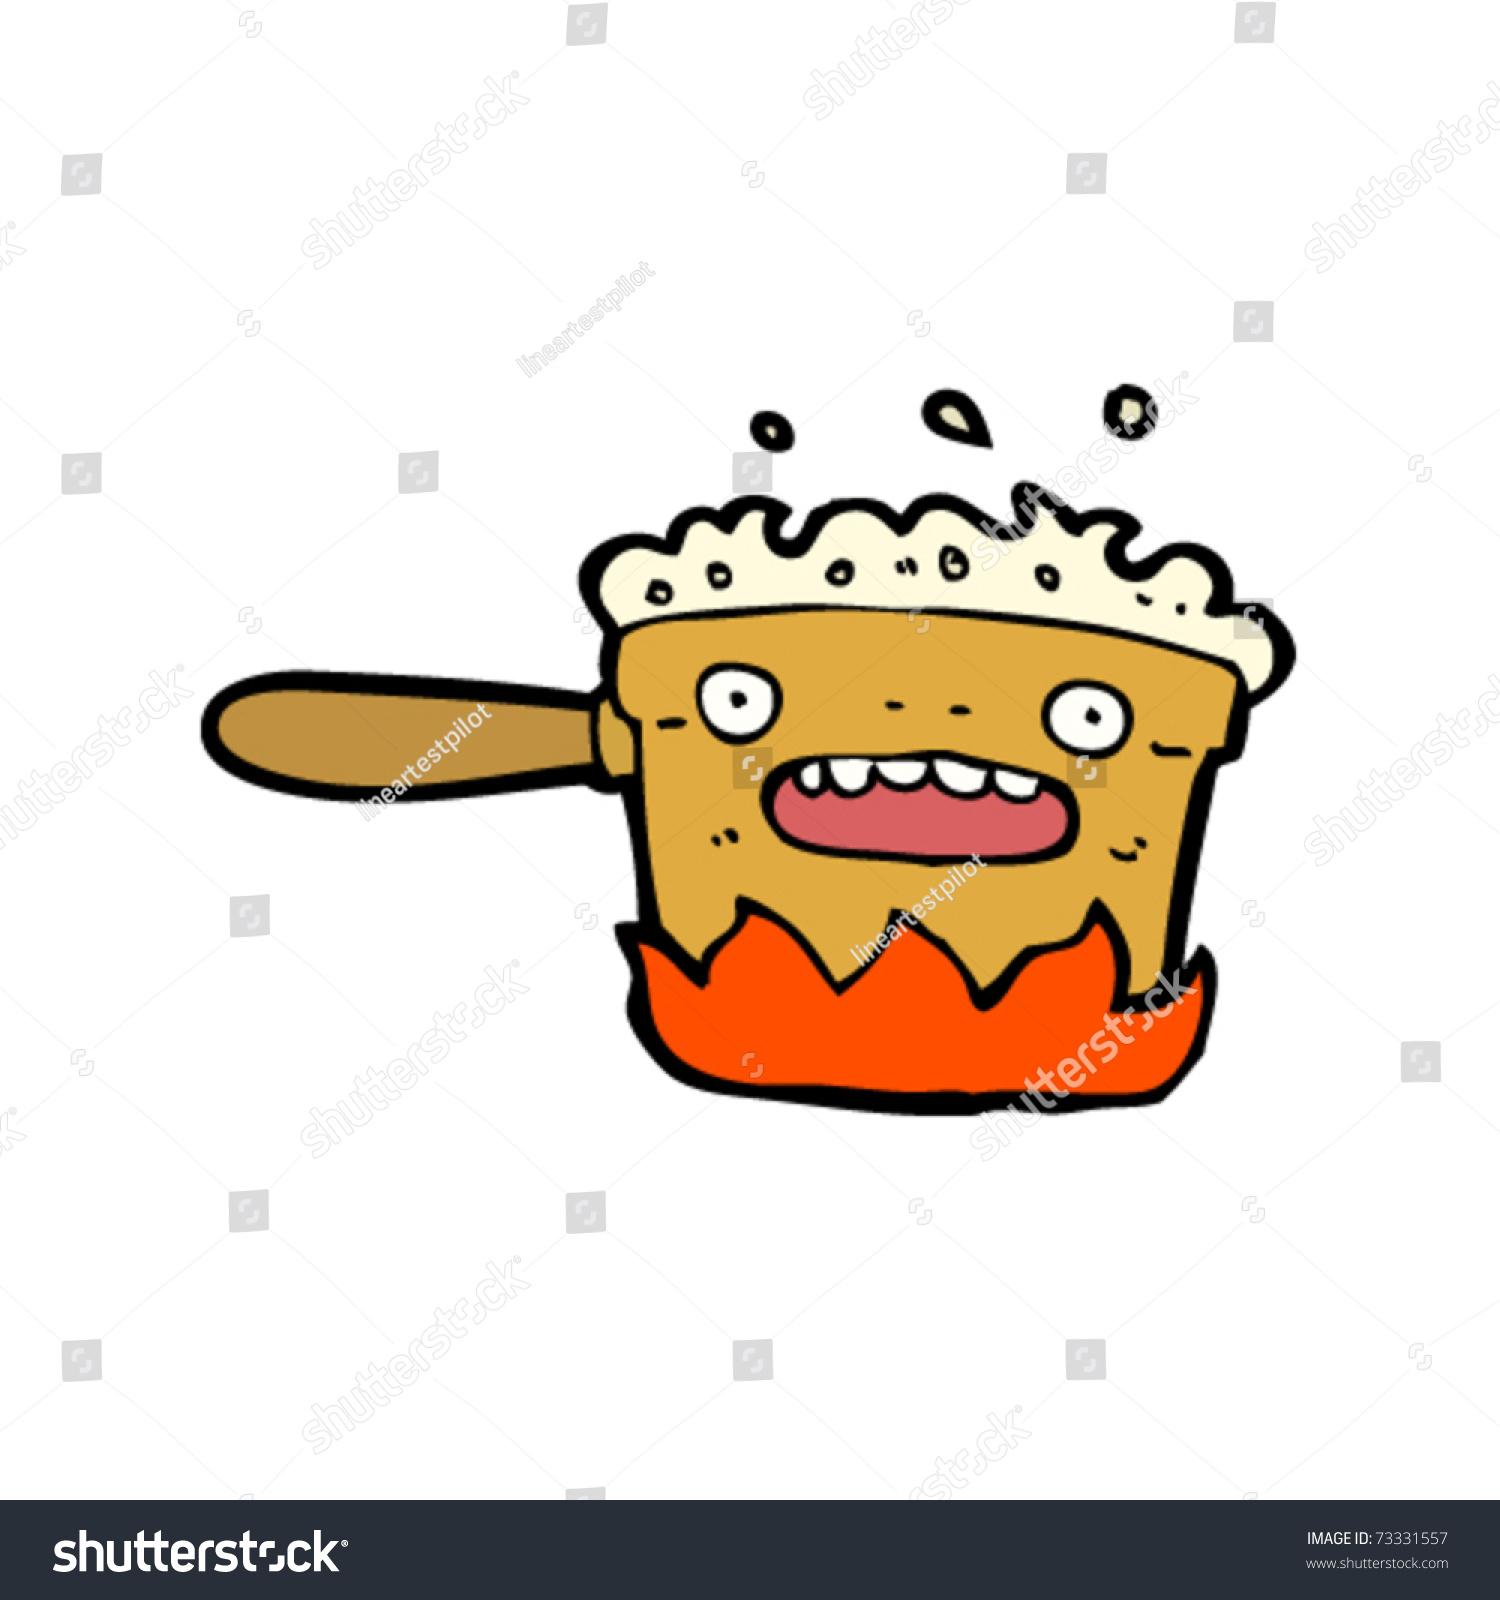 Kitchen Hob Cartoon ~ Cooking pan cartoon stock vector illustration